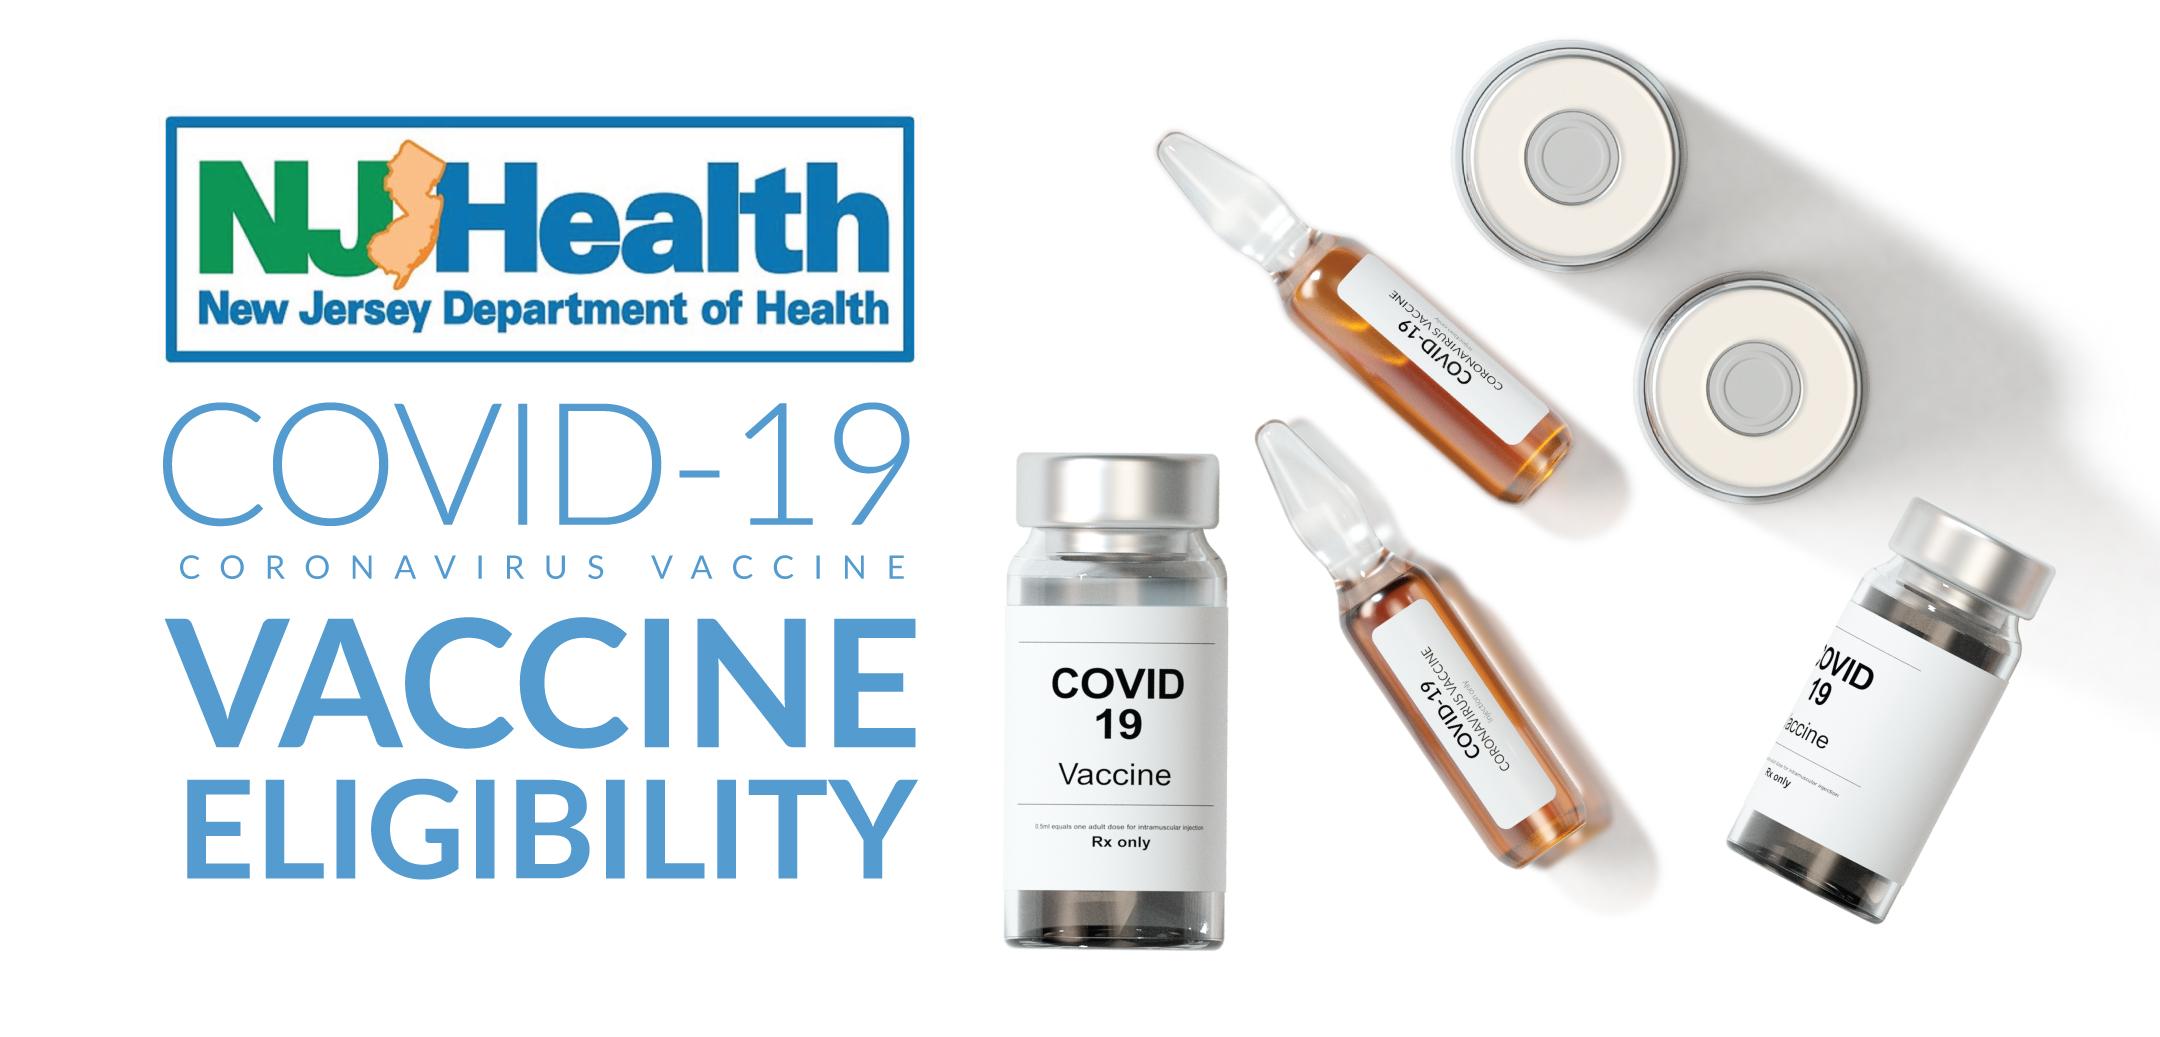 Vaccine-Eligibility-January-14-2021